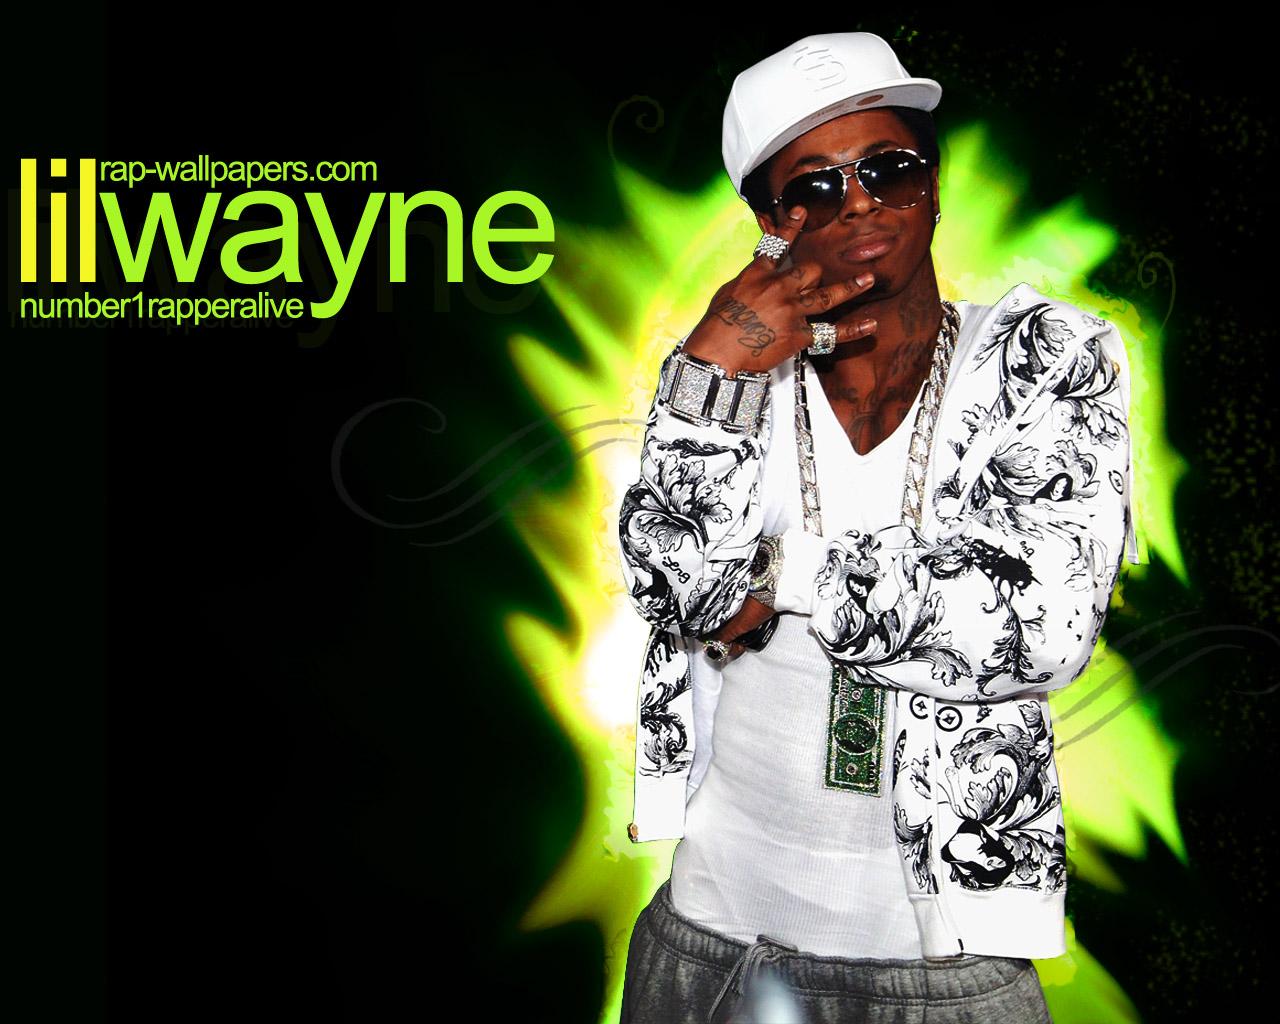 http://2.bp.blogspot.com/-xmmGaVd6Tjw/T_Ttgx6hNiI/AAAAAAAAACo/rfLf4BPyH6c/s1600/lil_wanye_wallpaper_12.jpg